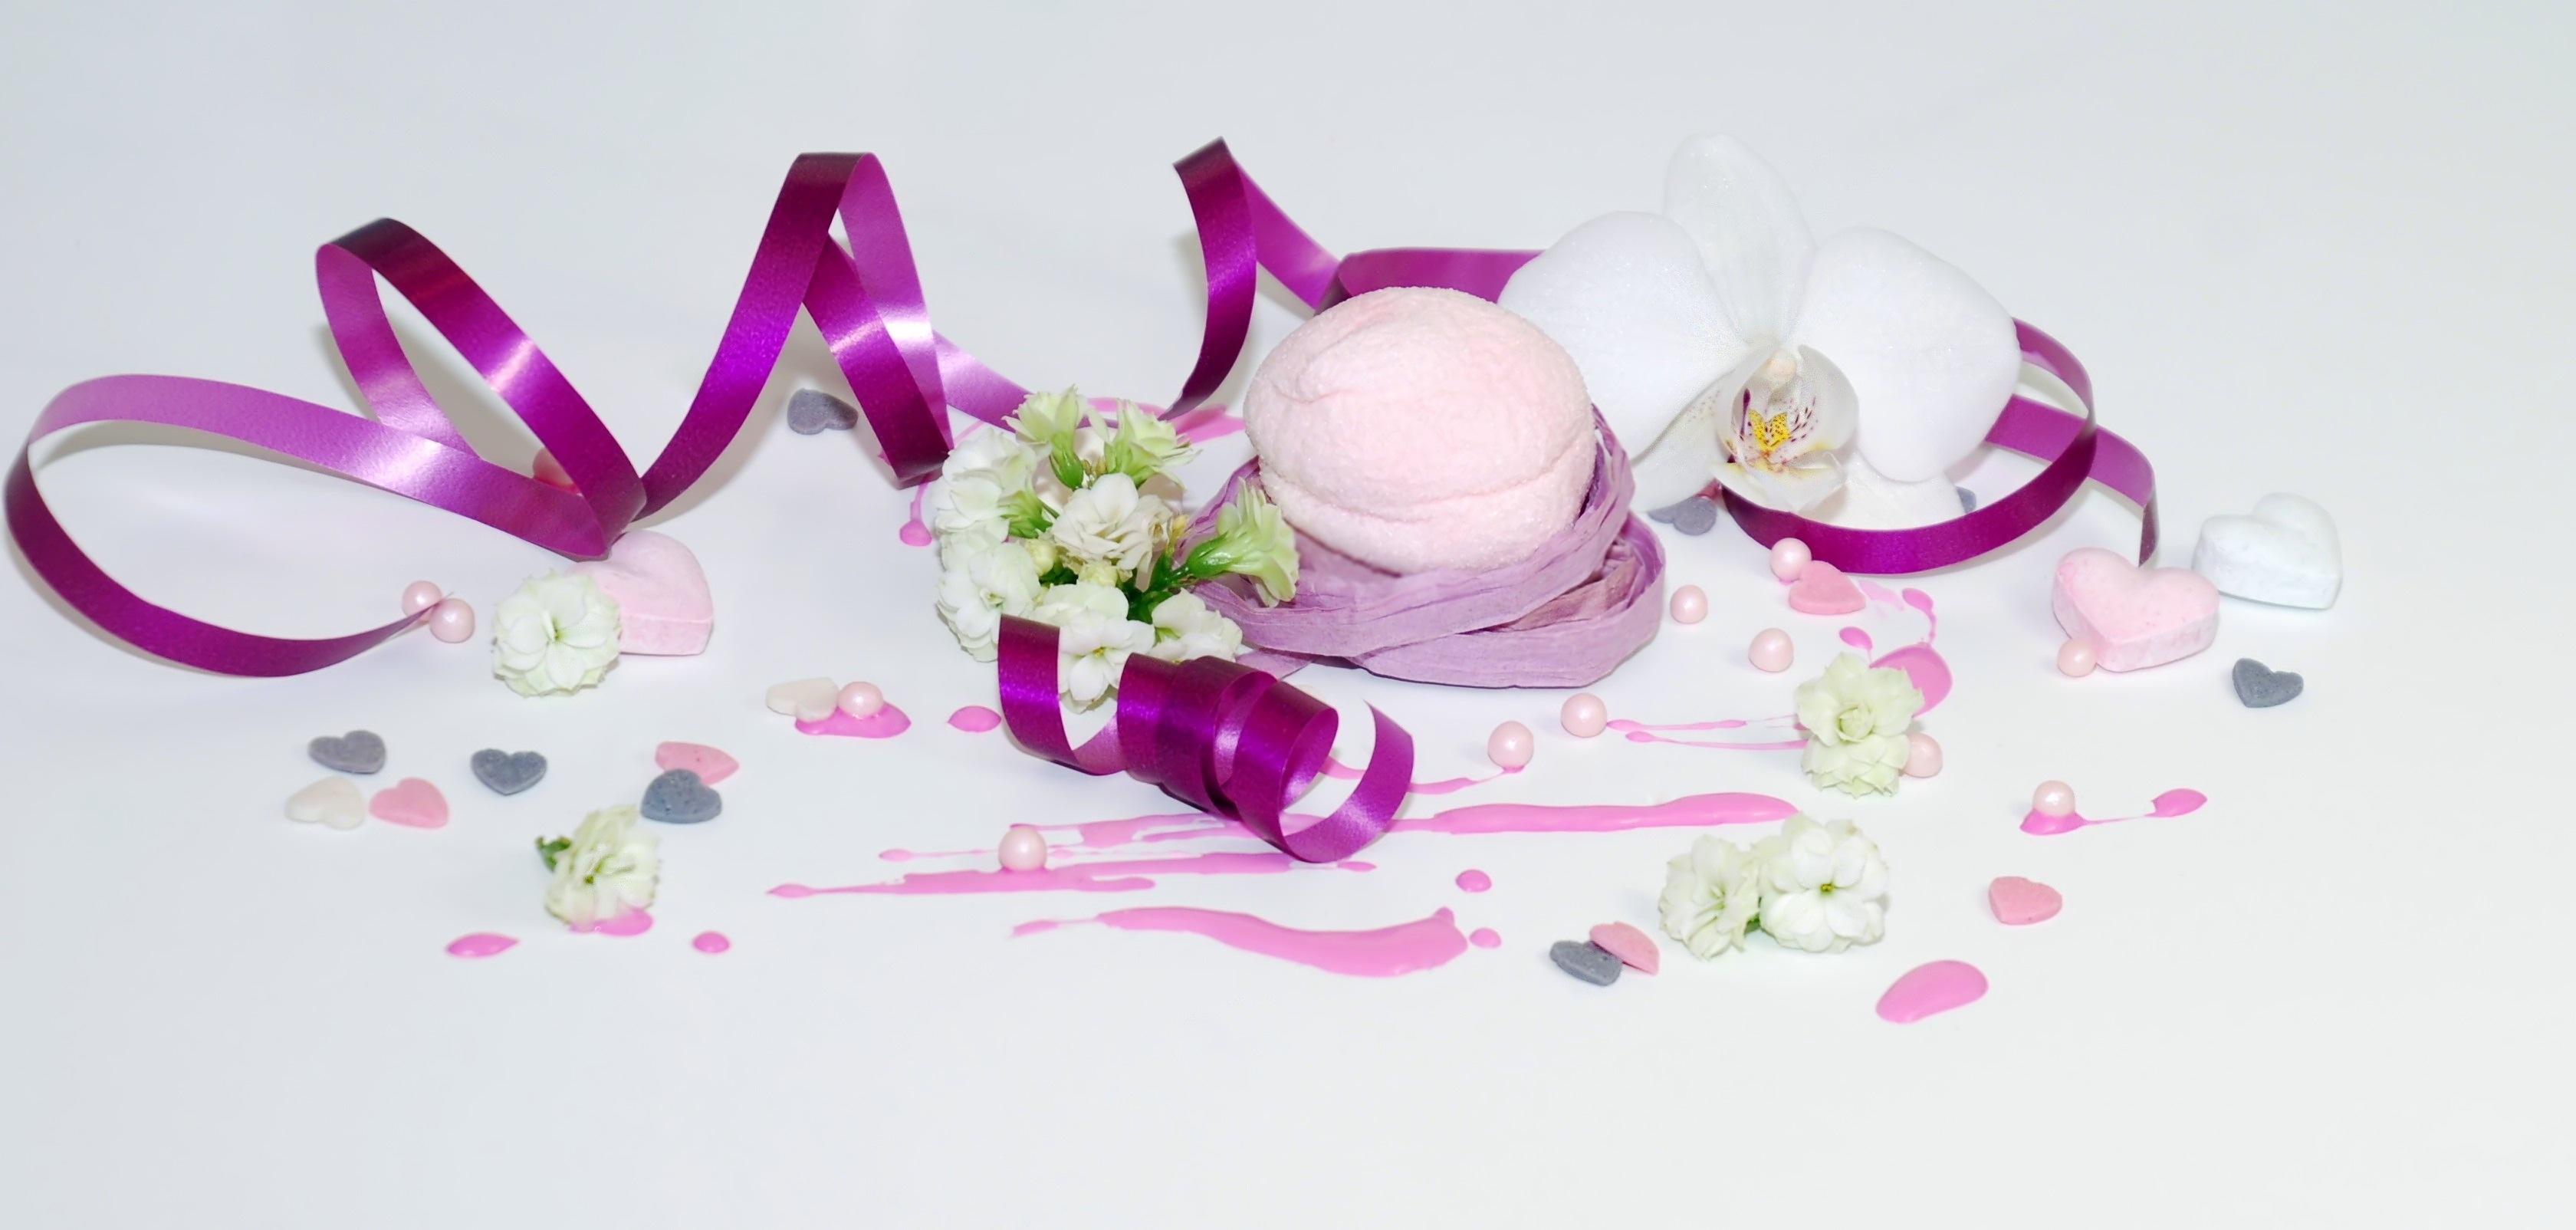 Free Images : white, purple, petal, heart, food, macro, romance ...